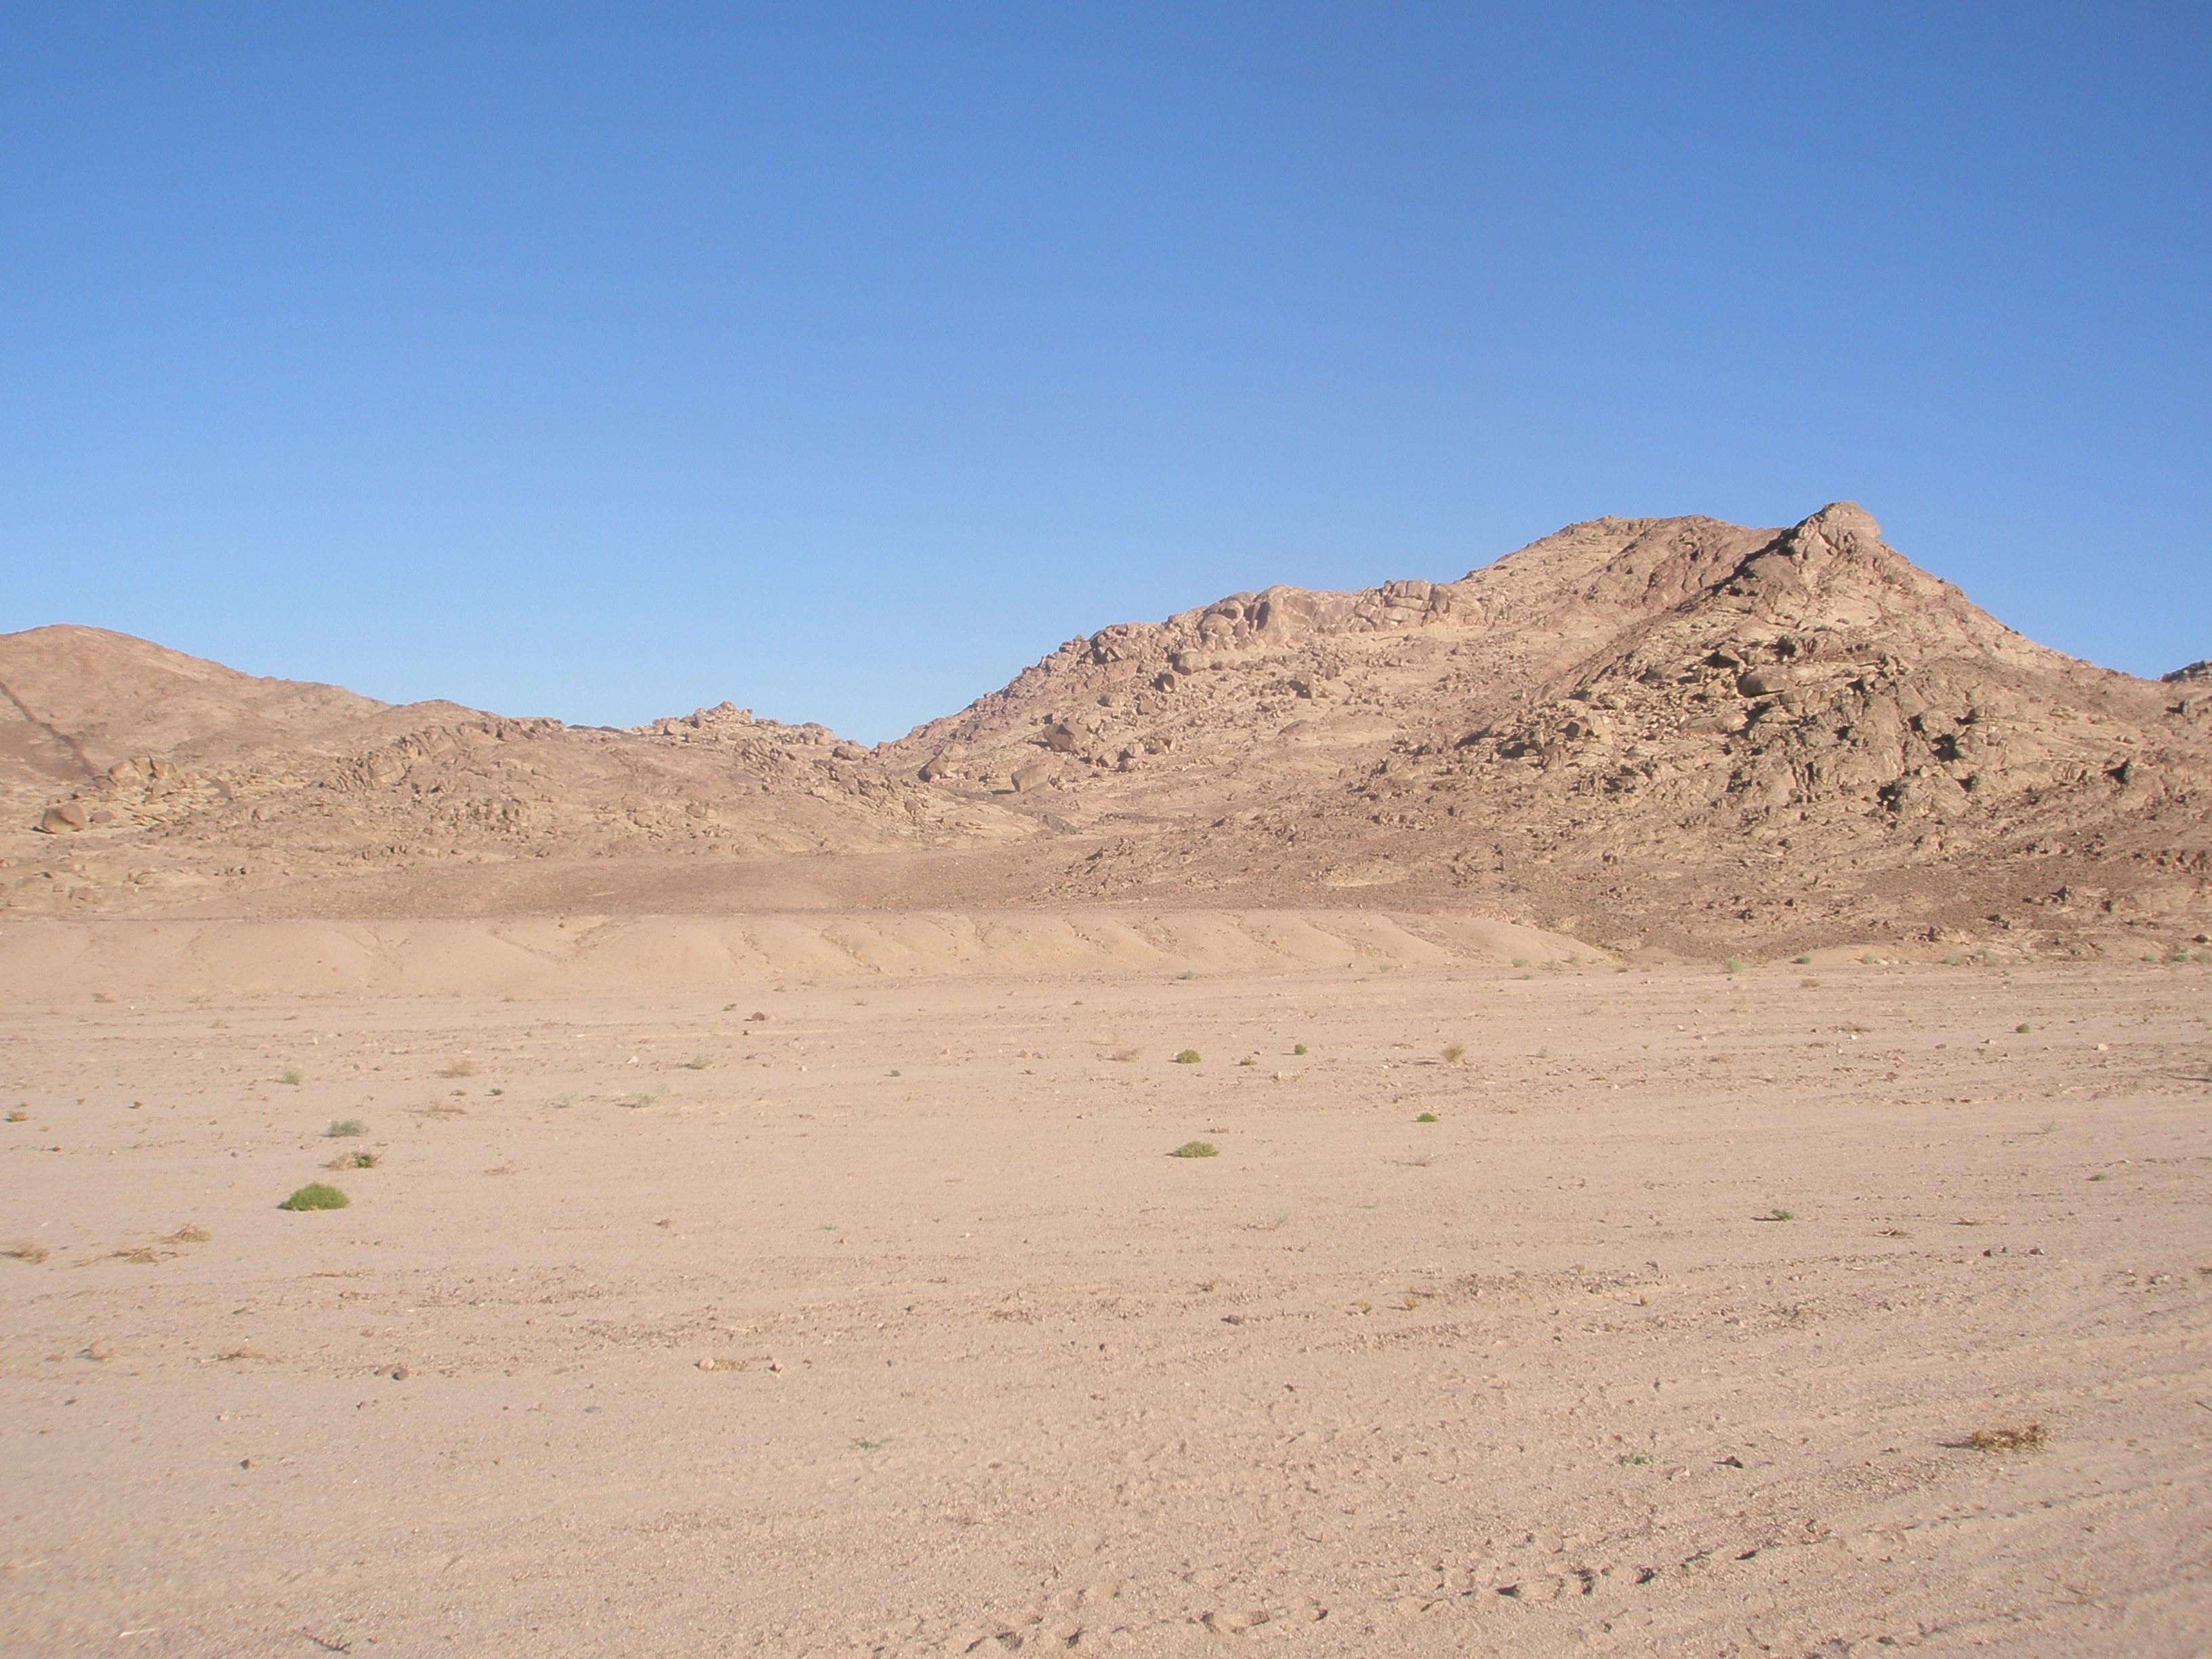 Sinai Desert Landscape by SemiRetiredJedi